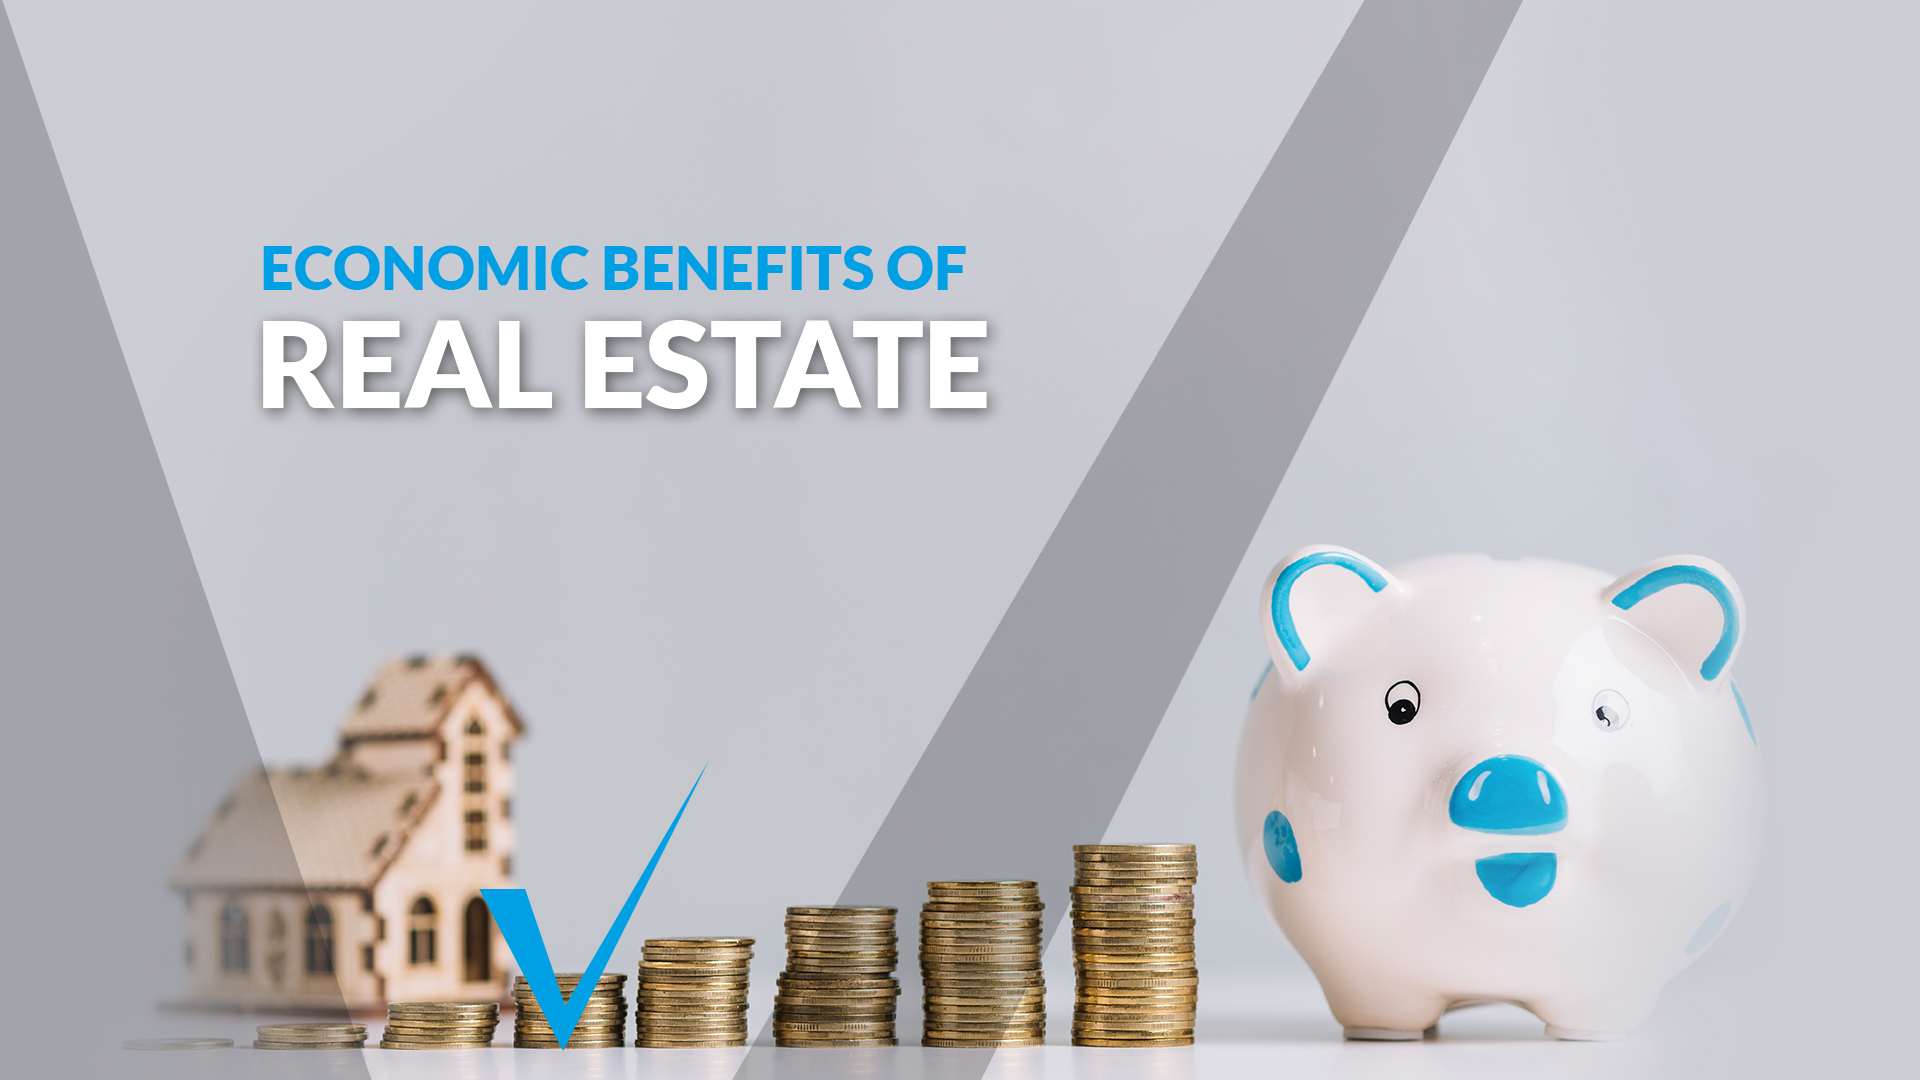 Economic benefits of real estate image